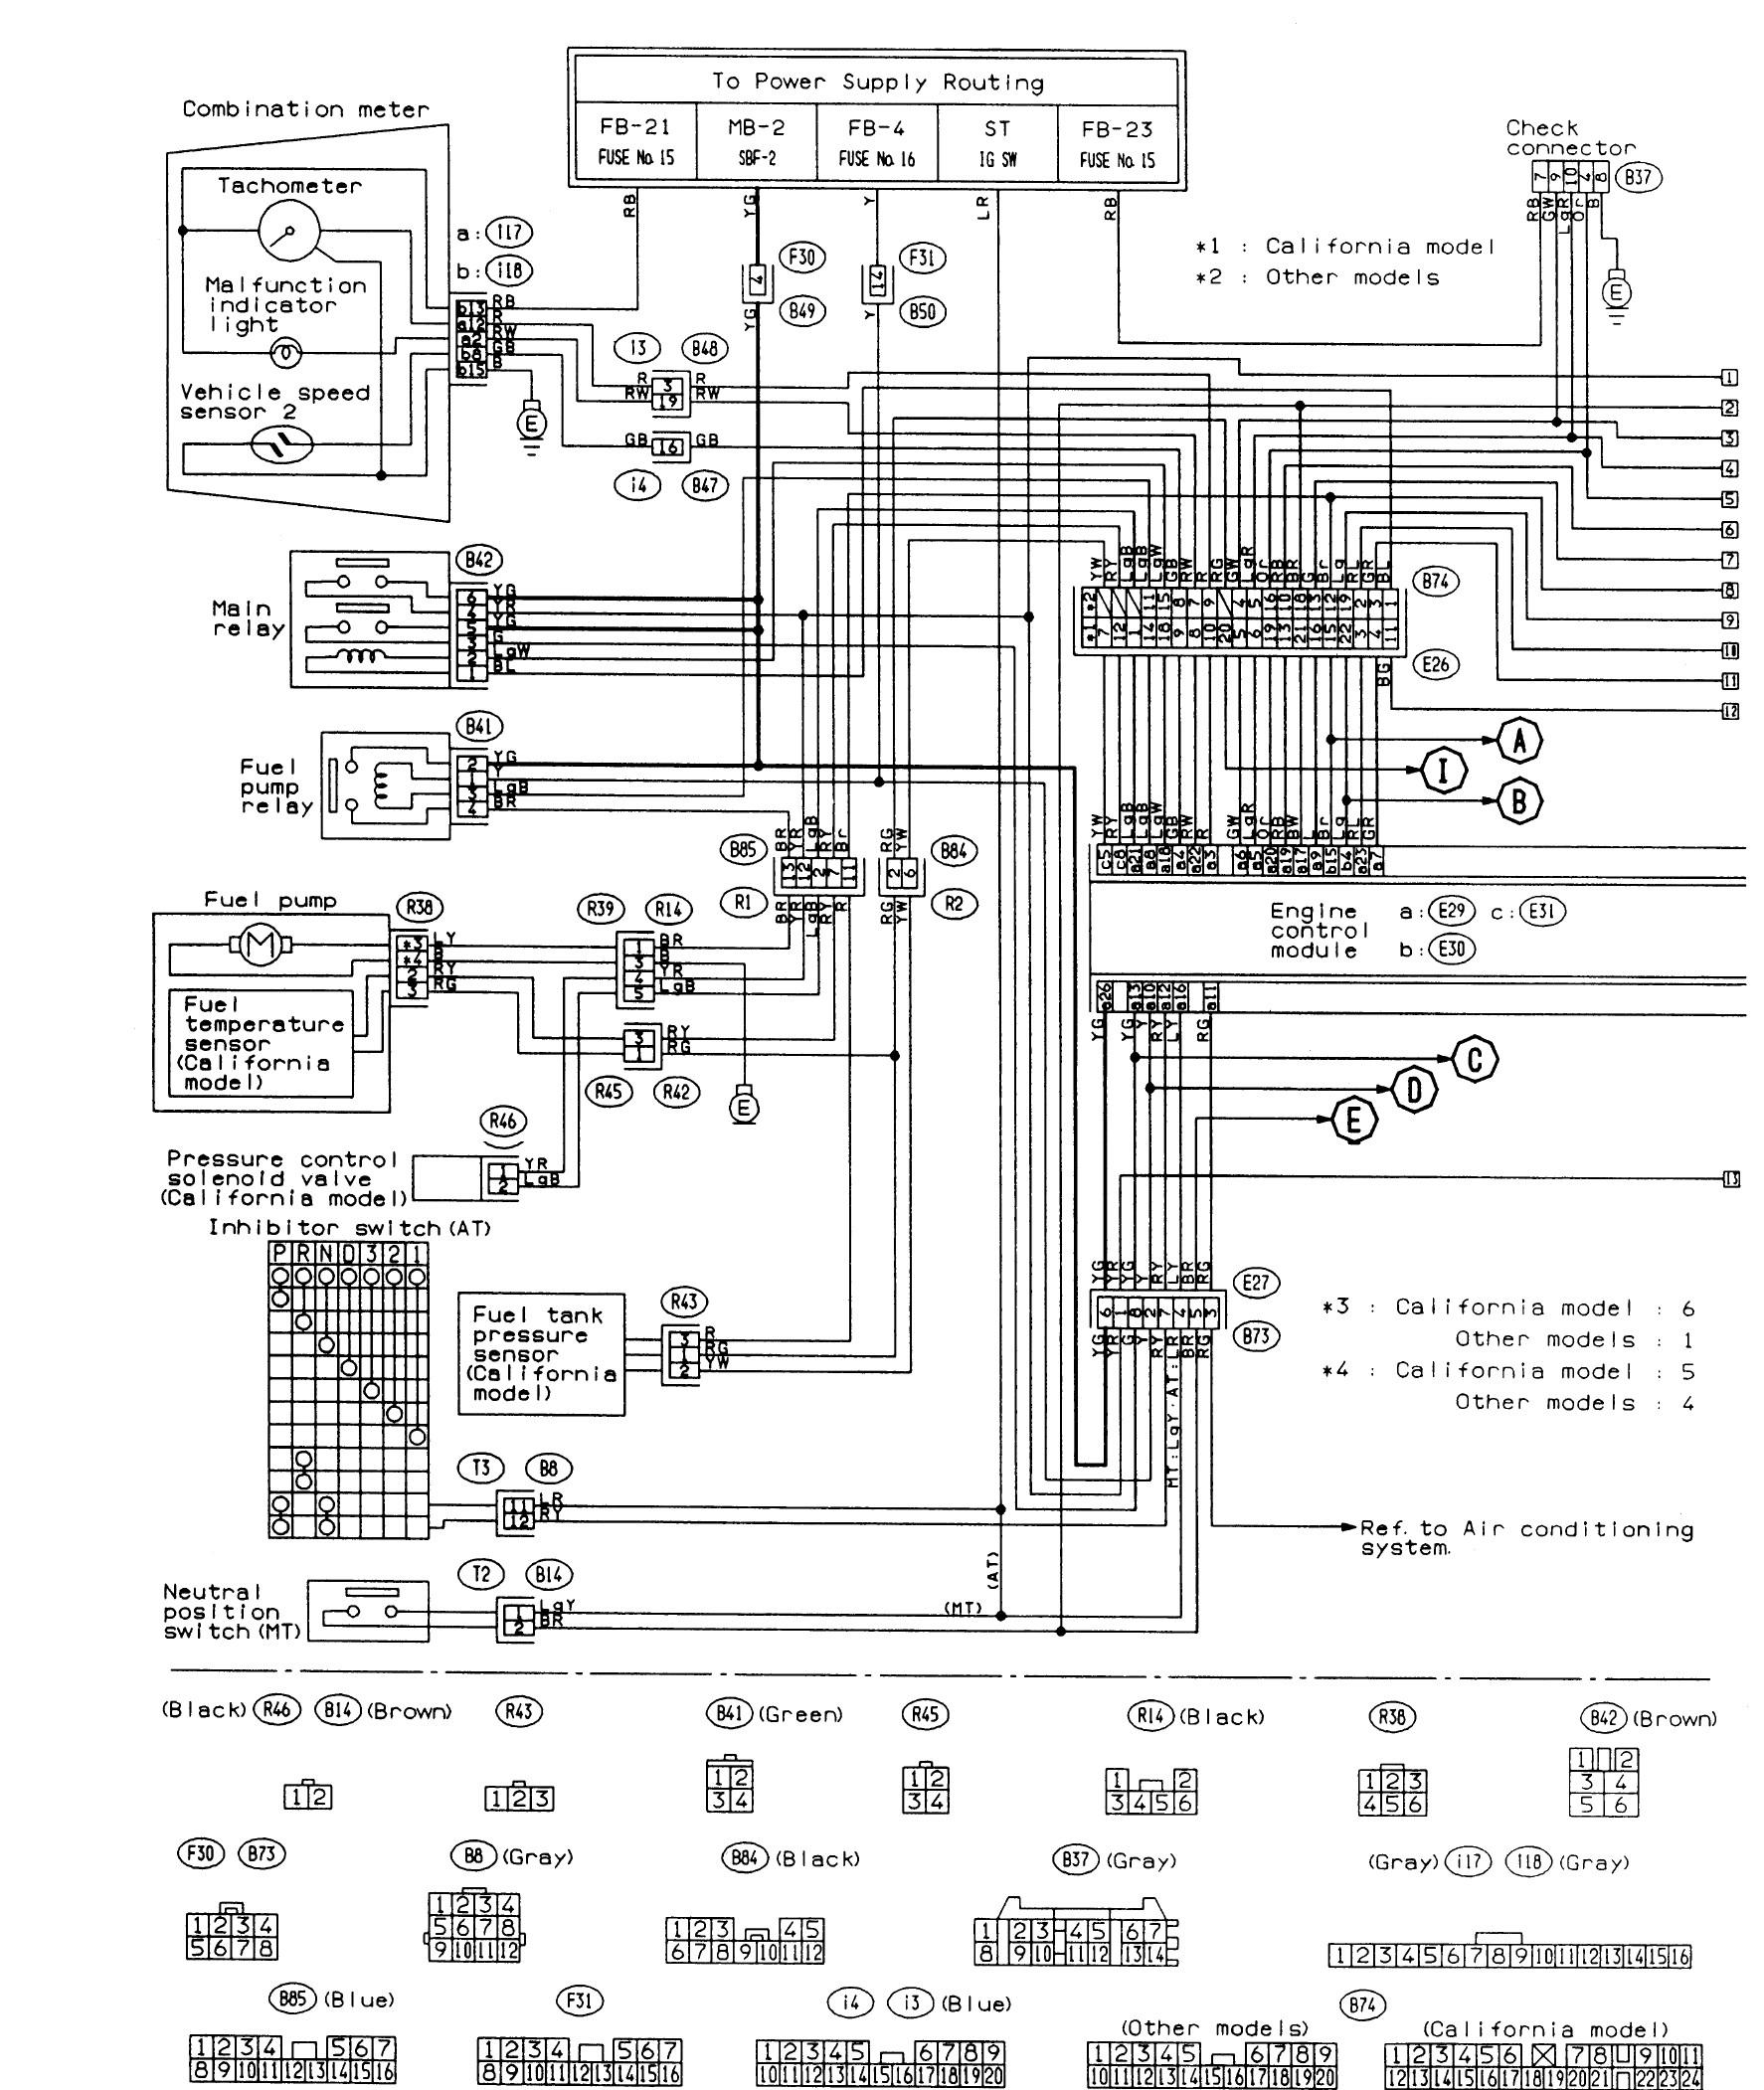 1995 subaru legacy engine diagram smart wiring diagrams u2022 rh emgsolutions co 99 Subaru Legacy 1993 subaru legacy fuse box location